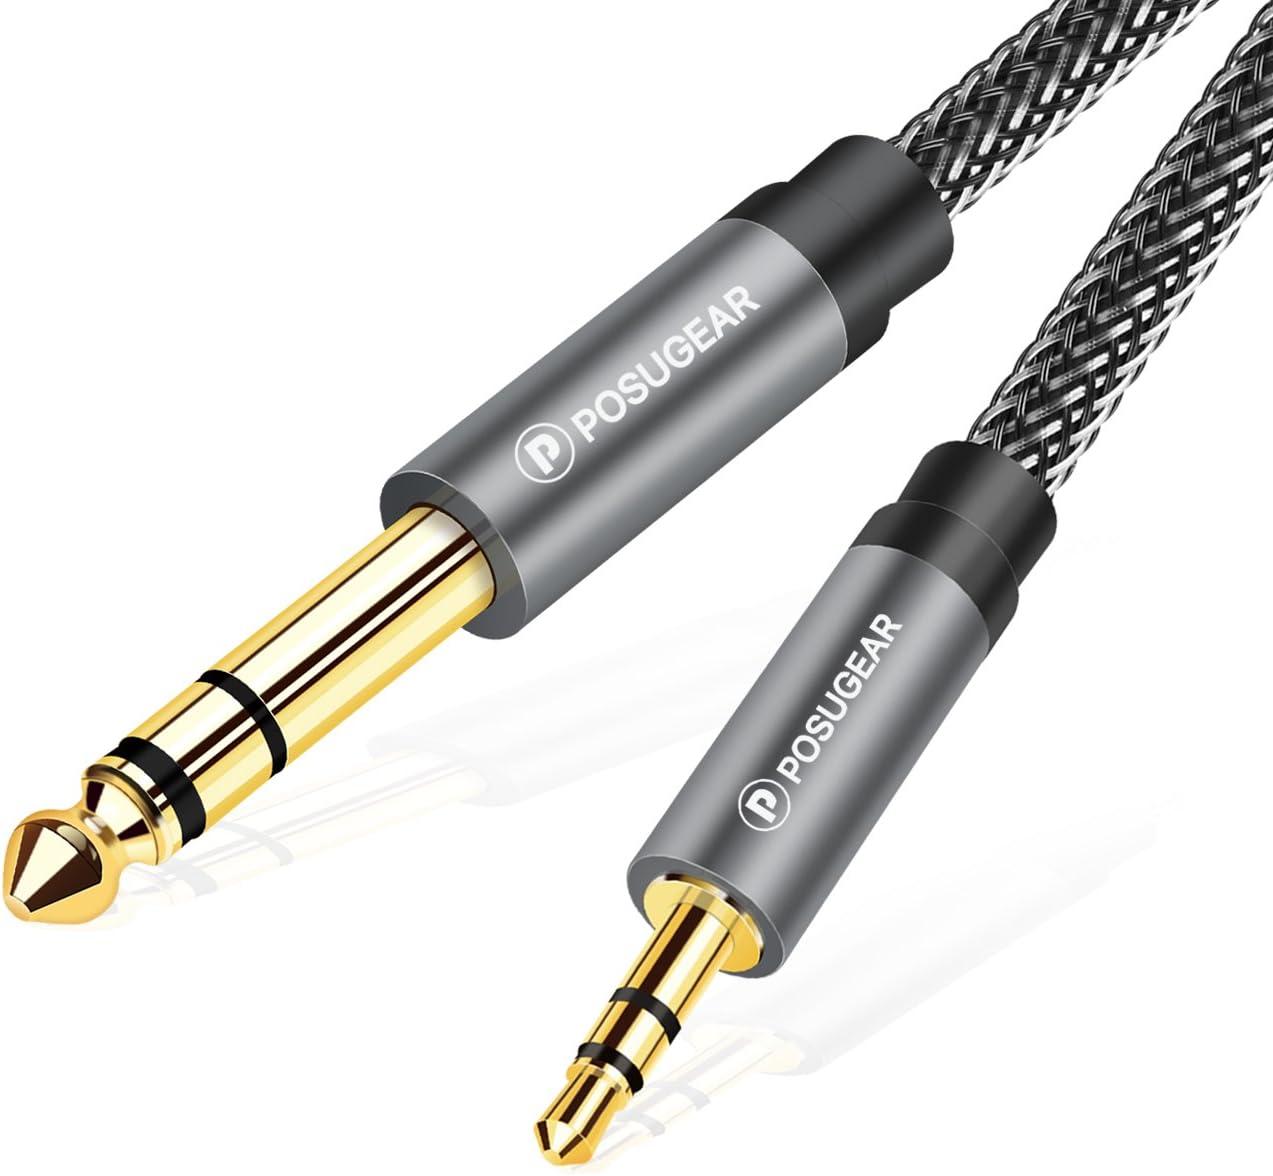 Cable de 6.35mm a 3.5mm, POSUGEAR Nylon Trenzado 3.5mm a 6.3mm Cable Audio Estéreo HiFi Macho a Macho para Reproductores de MP3, PCs, Amplificadores, Mesas de Mezclas, Ordenadores- 2M Ordenadores- 2M